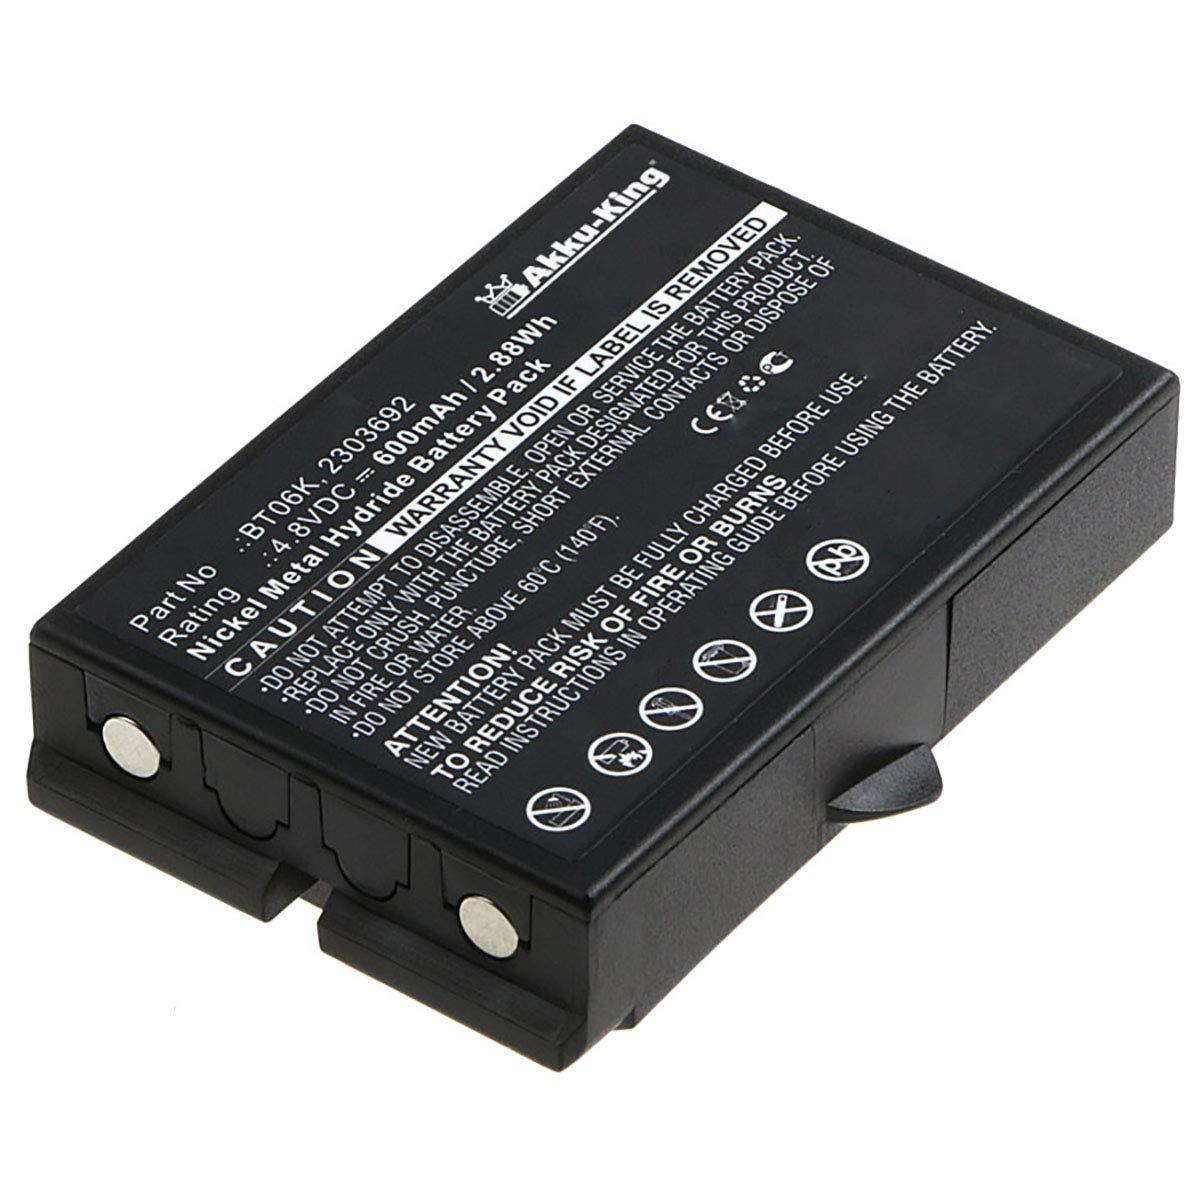 BT06K TM70 T70-1 RAD-TF transmitters T71 TM70//2 RAD-TS TM70//1 Akku-King bater/ía para Ikusi 2303692 Ni-Mh 600mAh como 2303692 T70-2 T72 ATEX transmitters